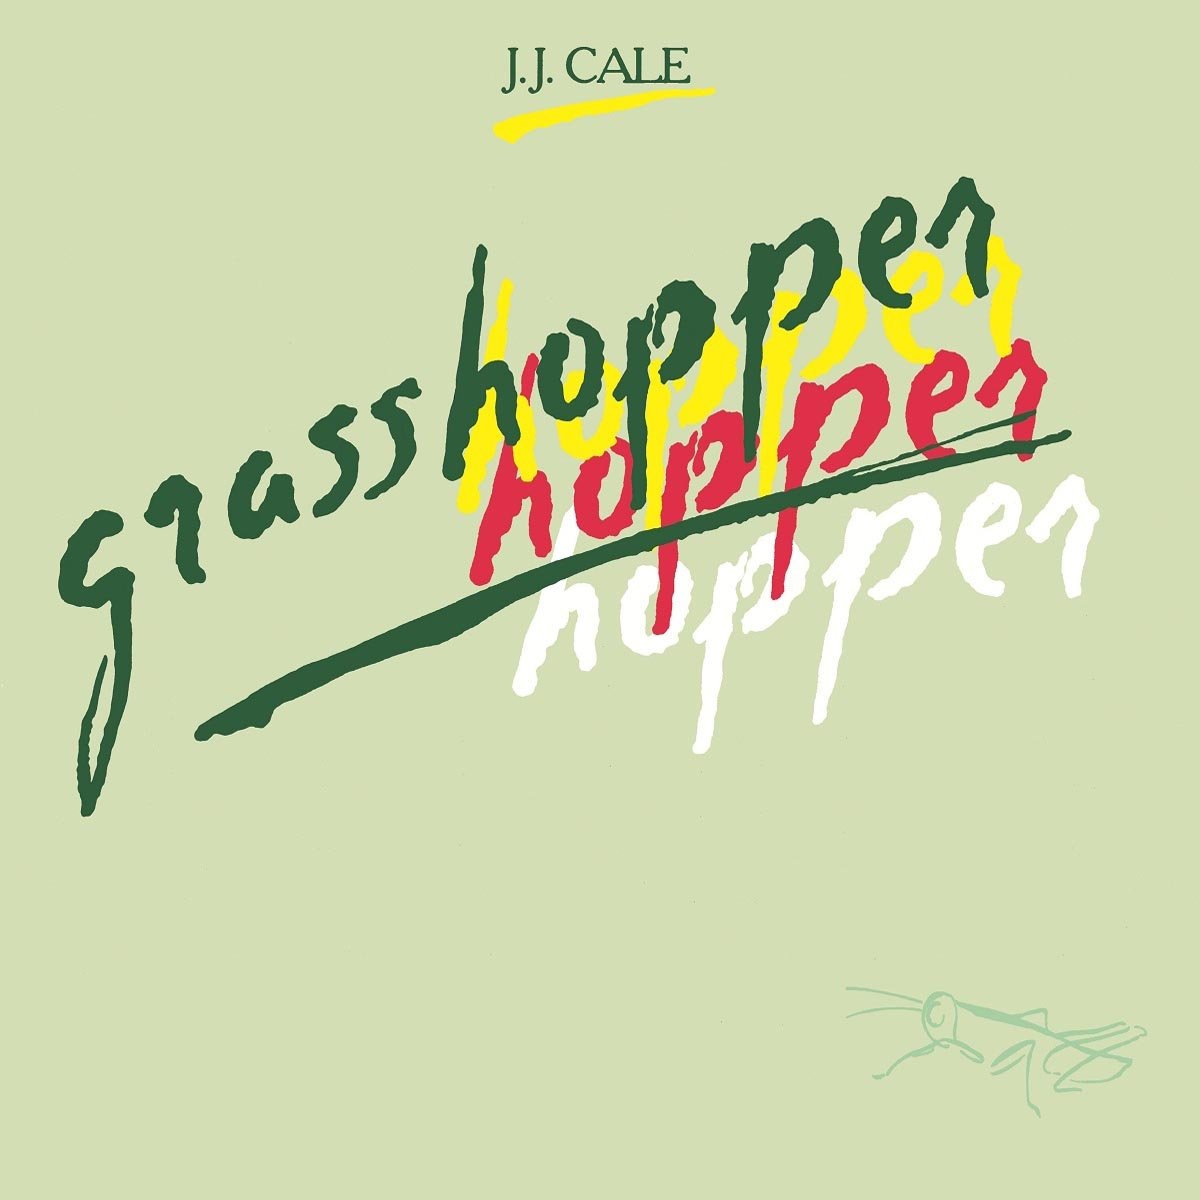 Дж.Дж. Кейл J.J. Cale. Grasshopper (LP) j j cale j j cale grasshopper